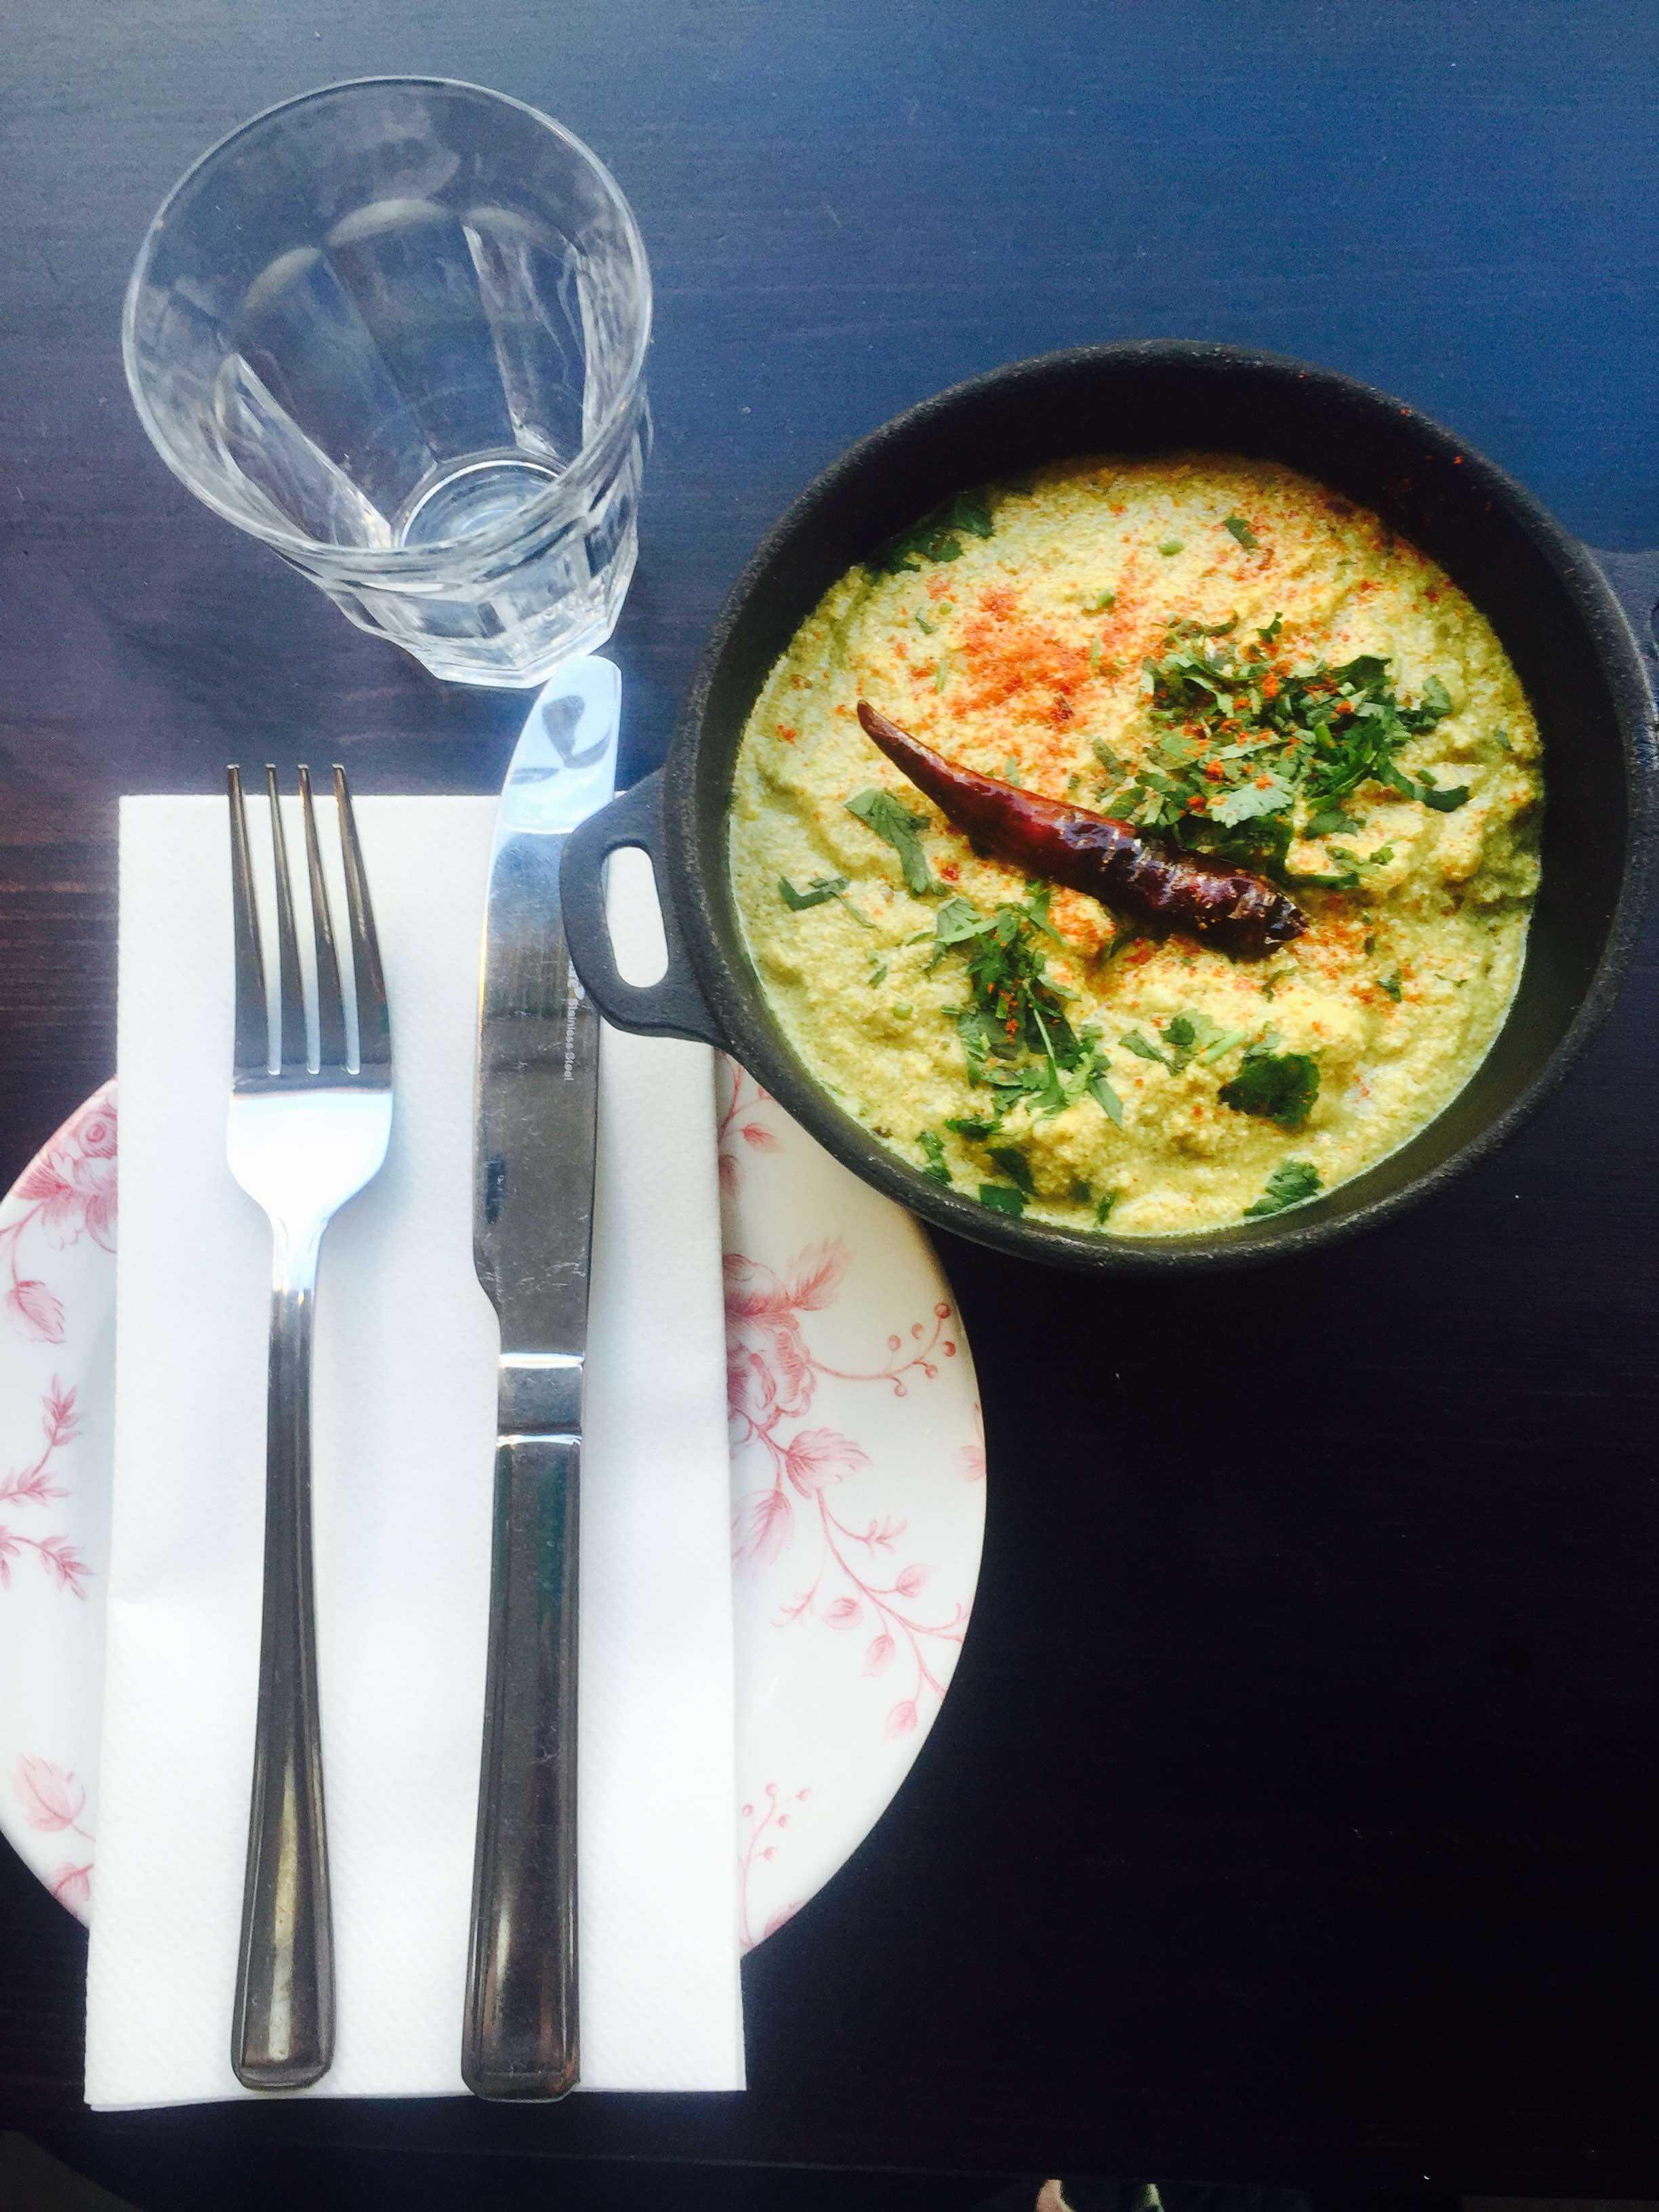 vegetarian Indian restaurants in London, indian vegetarian restaurant london, vegetarian indian restaurant london, indian vegetarian restaurants in london, indian vegetarian london, indian vegetarian restaurant, vegetarian indian london, indian vegetarian restaurant in london, london indian vegetarian restaurants, indian vegetarian restaurant near me, pure vegetarian indian restaurant london, indian vegetarian restaurants near me, indian vegetarian food, vegetarian indian restaurants near me, south indian vegetarian food, vegetarian indian food, vegetarian indian restaurant, indian restaurant vegetarian